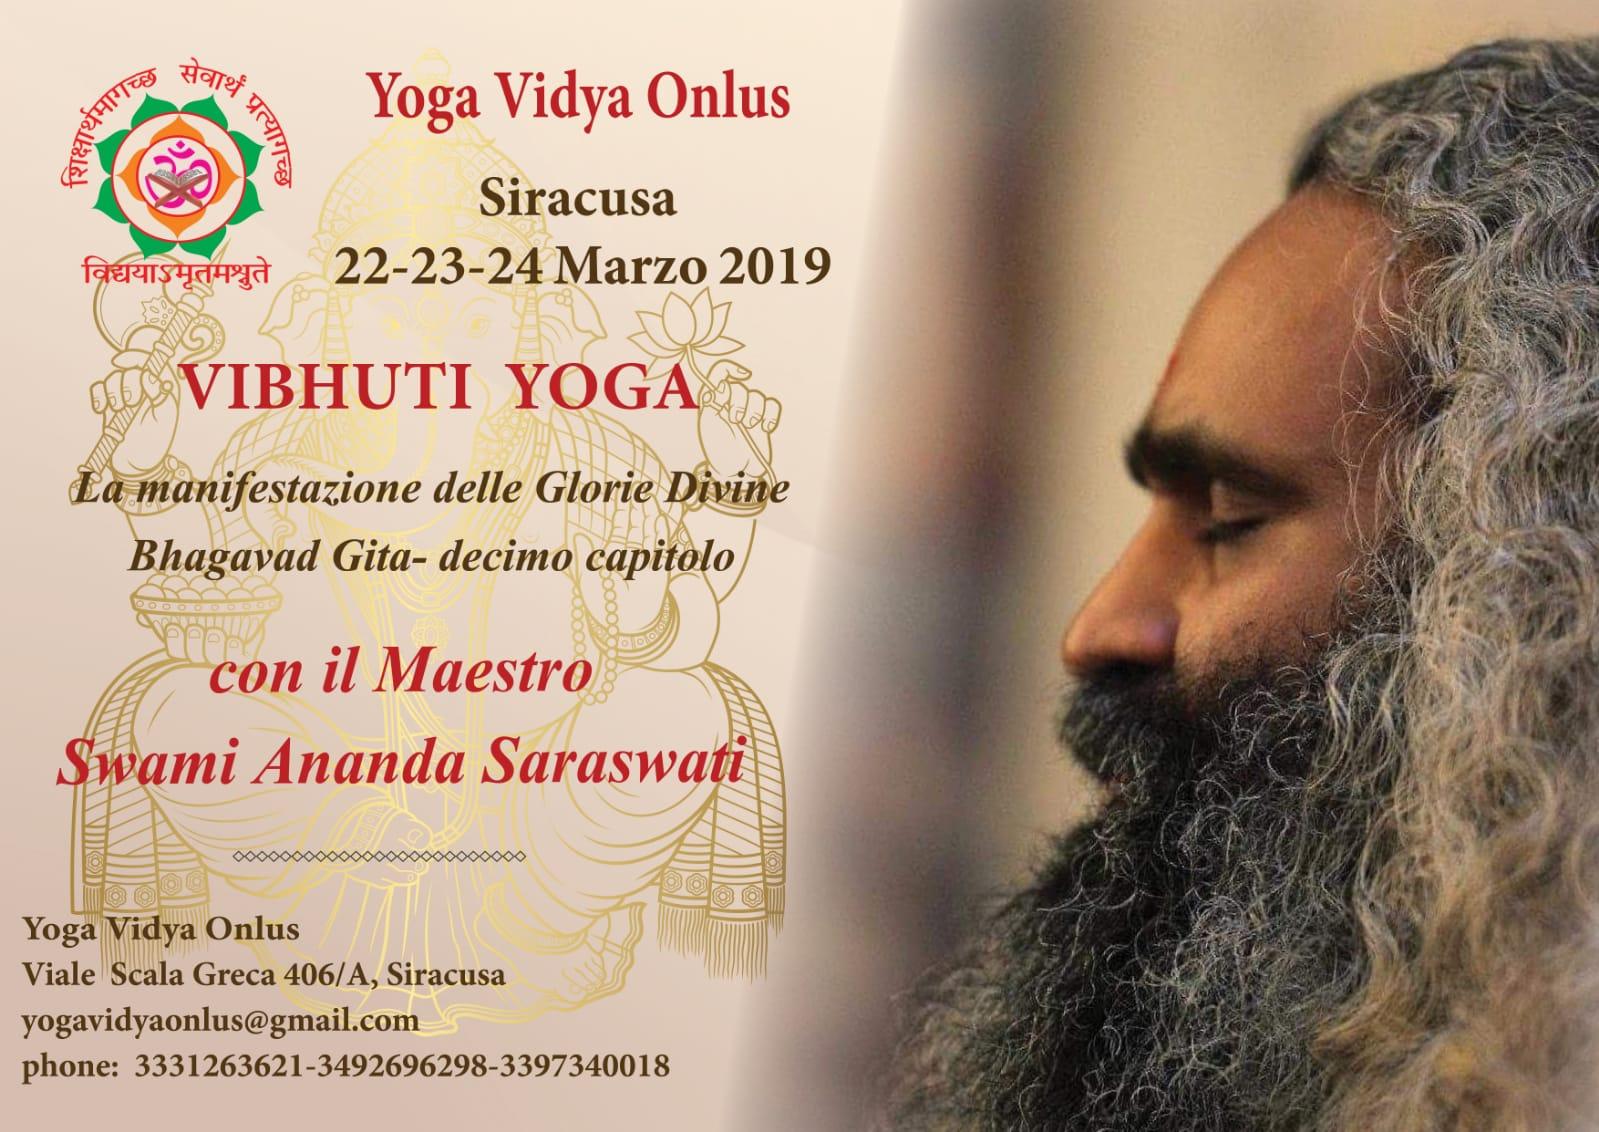 La manifestazione delle glorie divine Bhagavad gita-siracusa